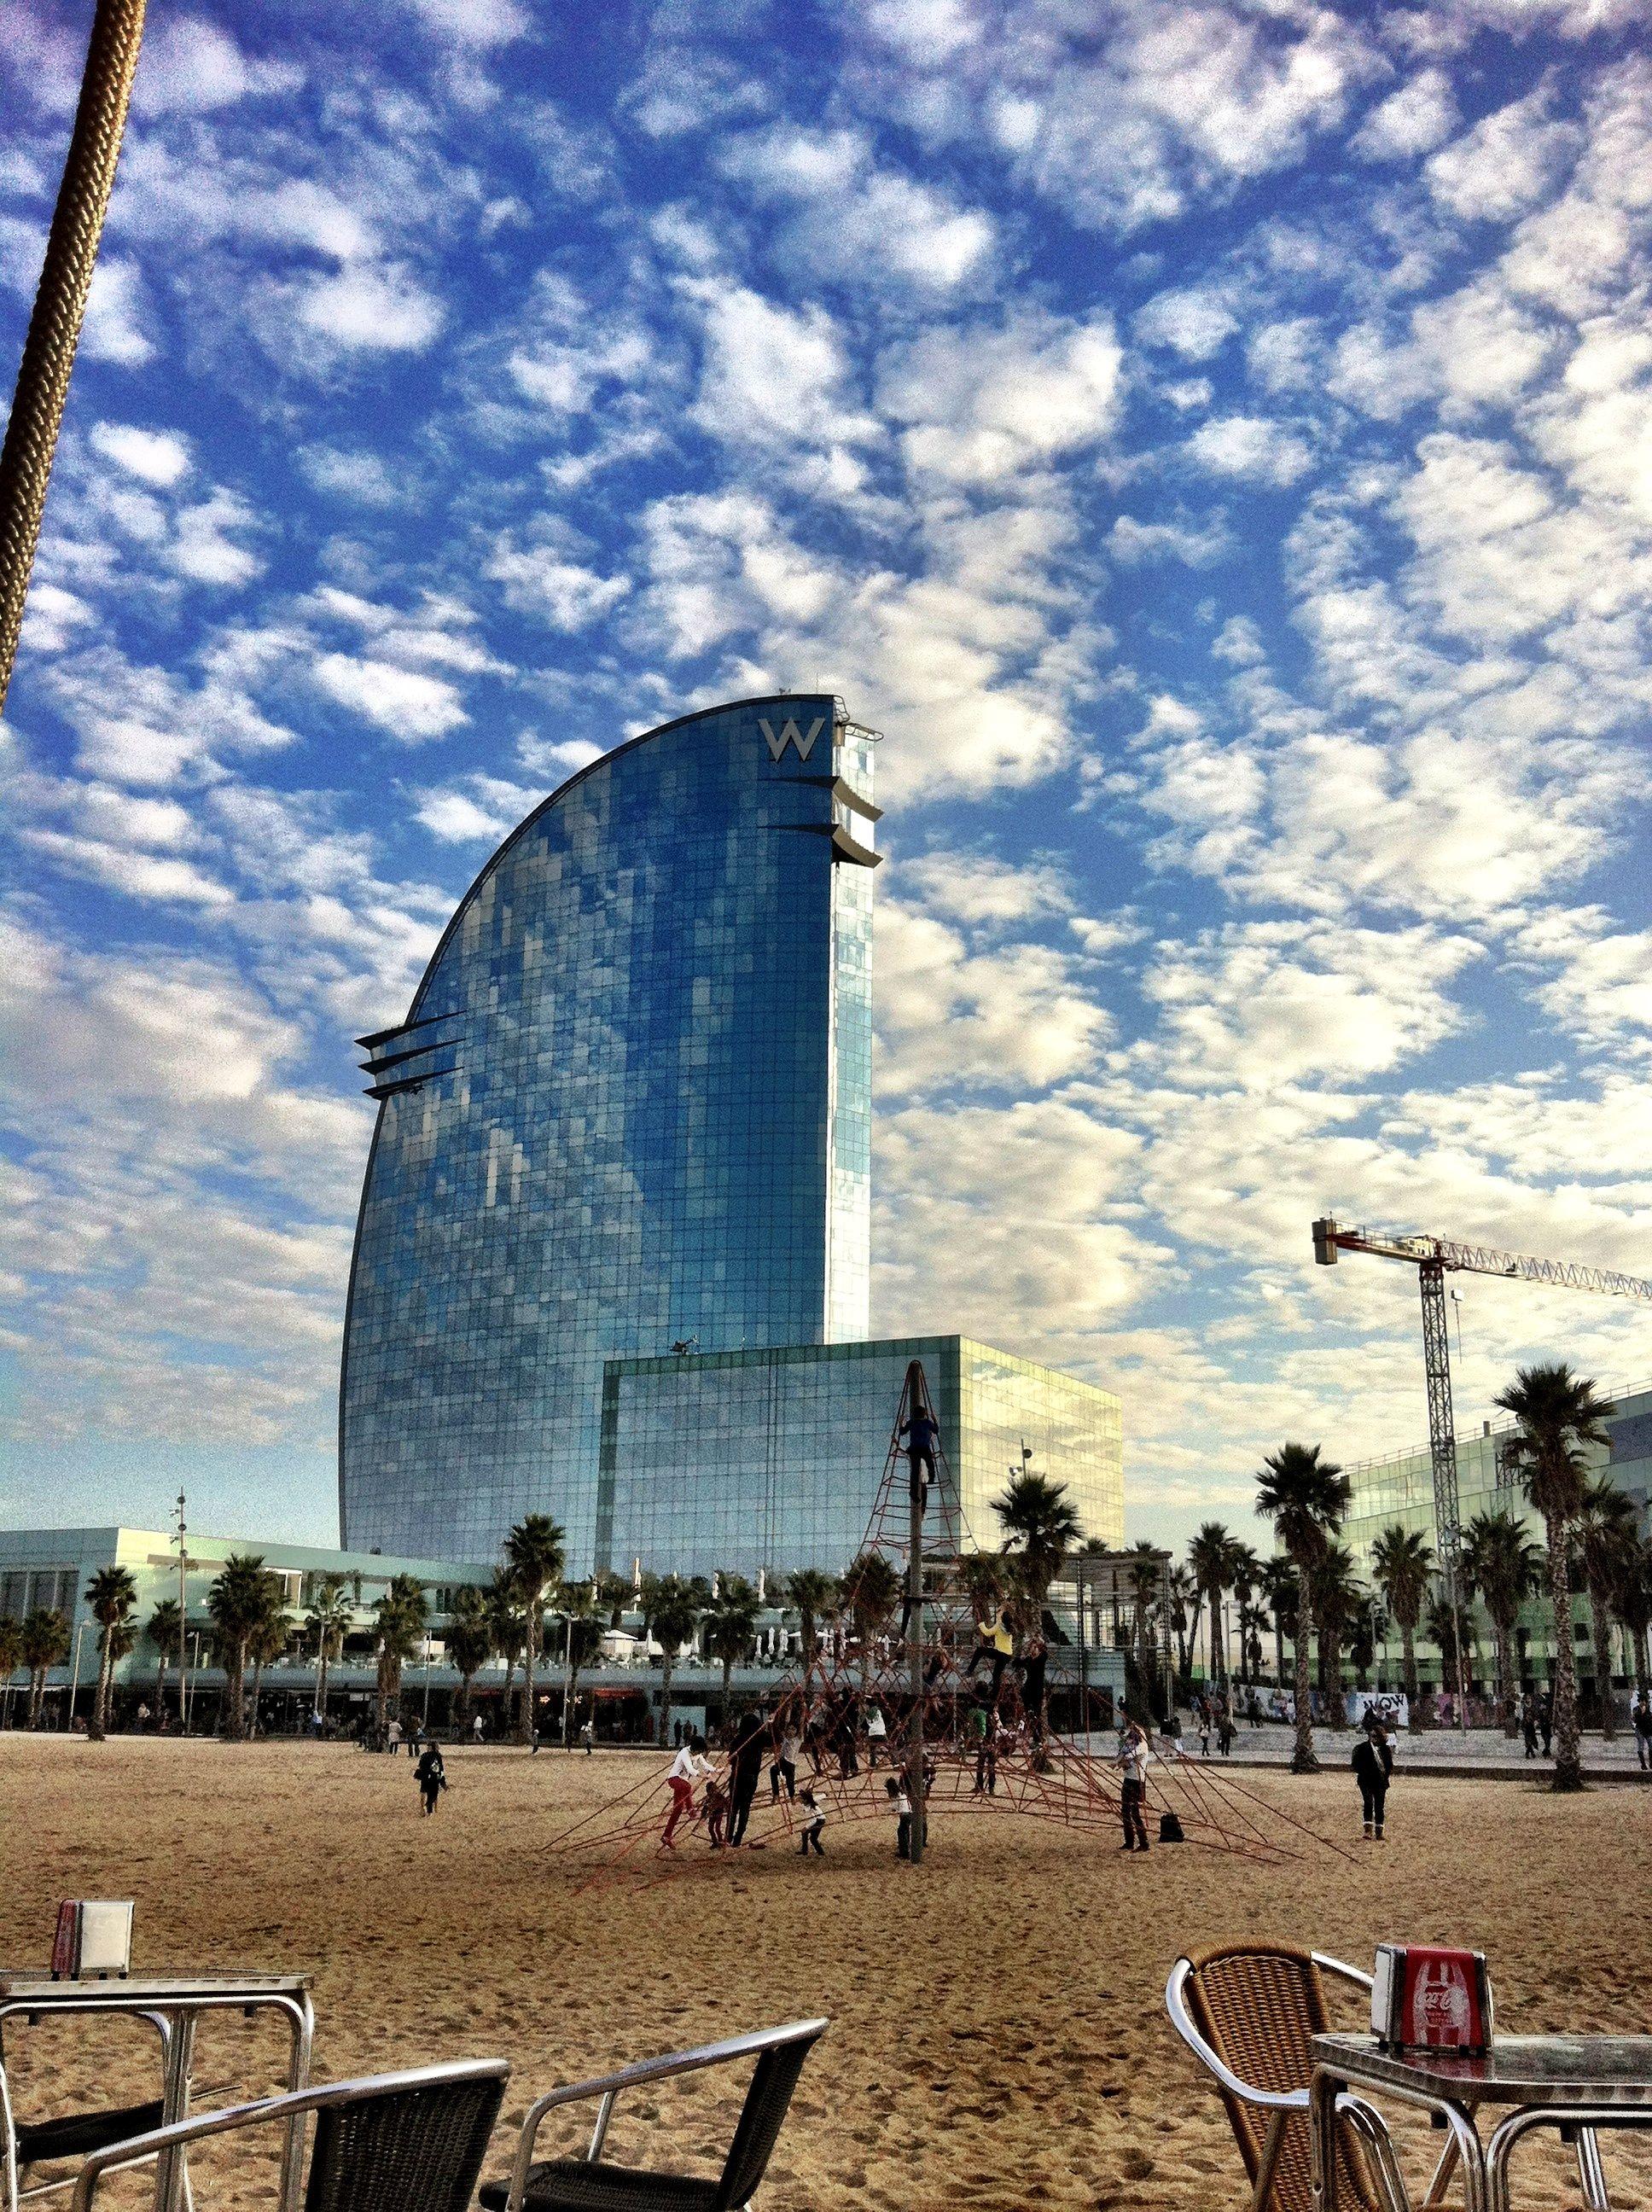 The W Hotel in Barcelona by Ricardo Bofill, w hotel spanish architect ...